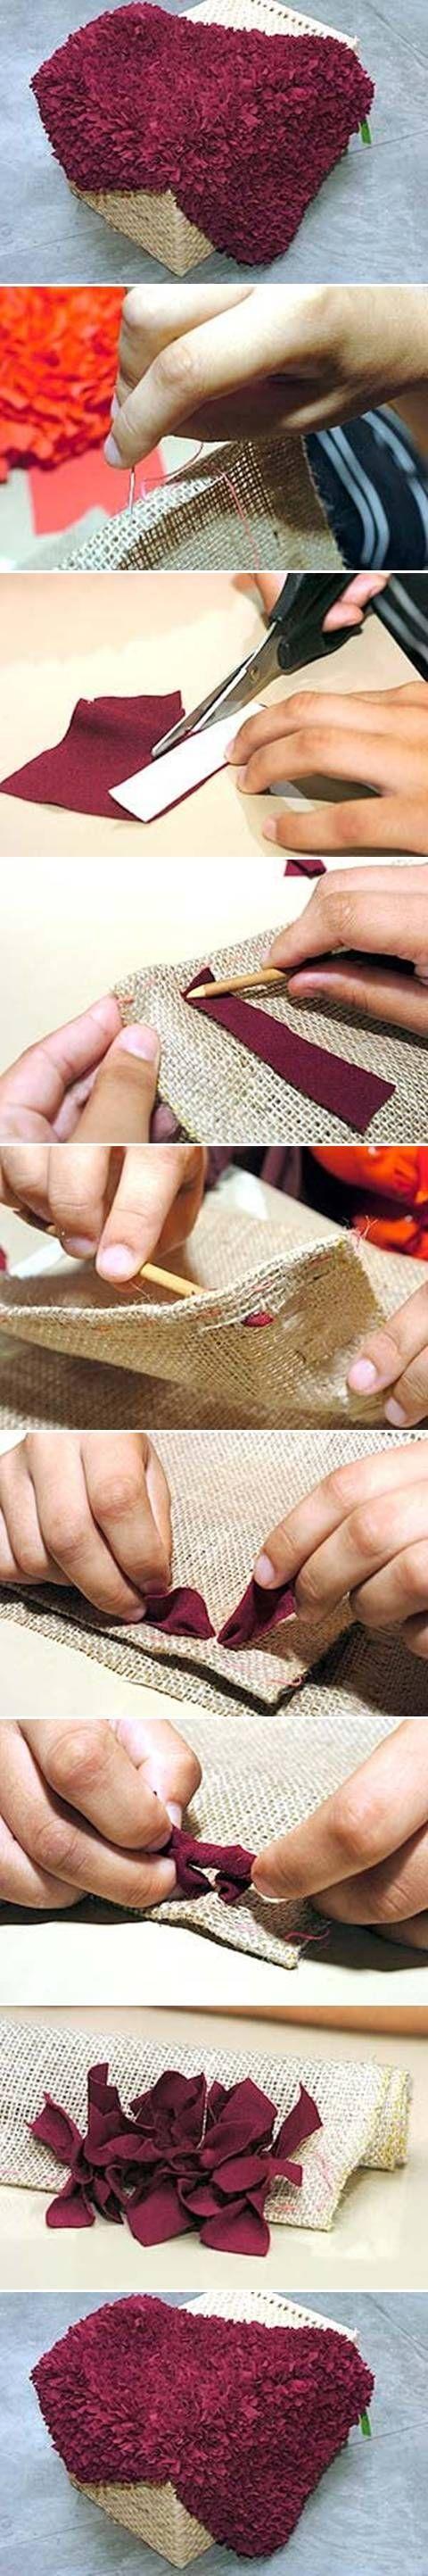 DIY Scrap Fabric Rug DIY Scrap Fabric Rug by mutsuko.mu.morisue